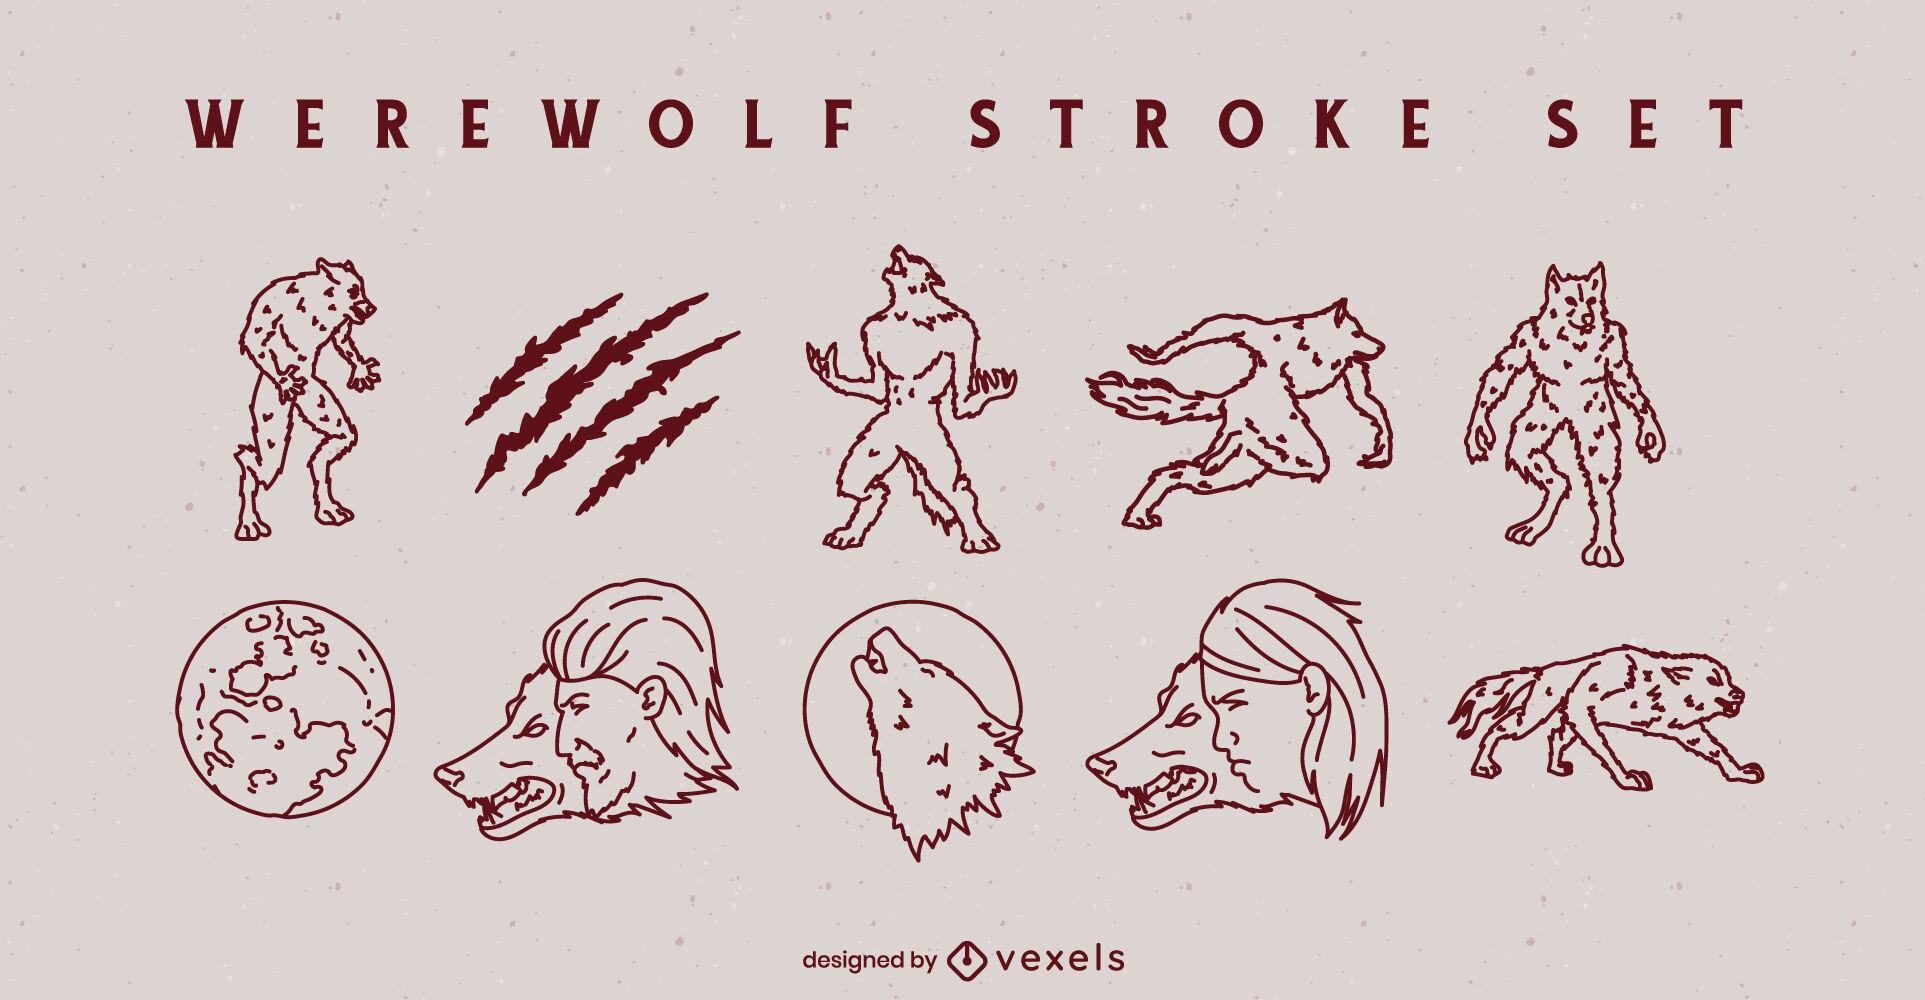 Werewolf monster characters stroke set